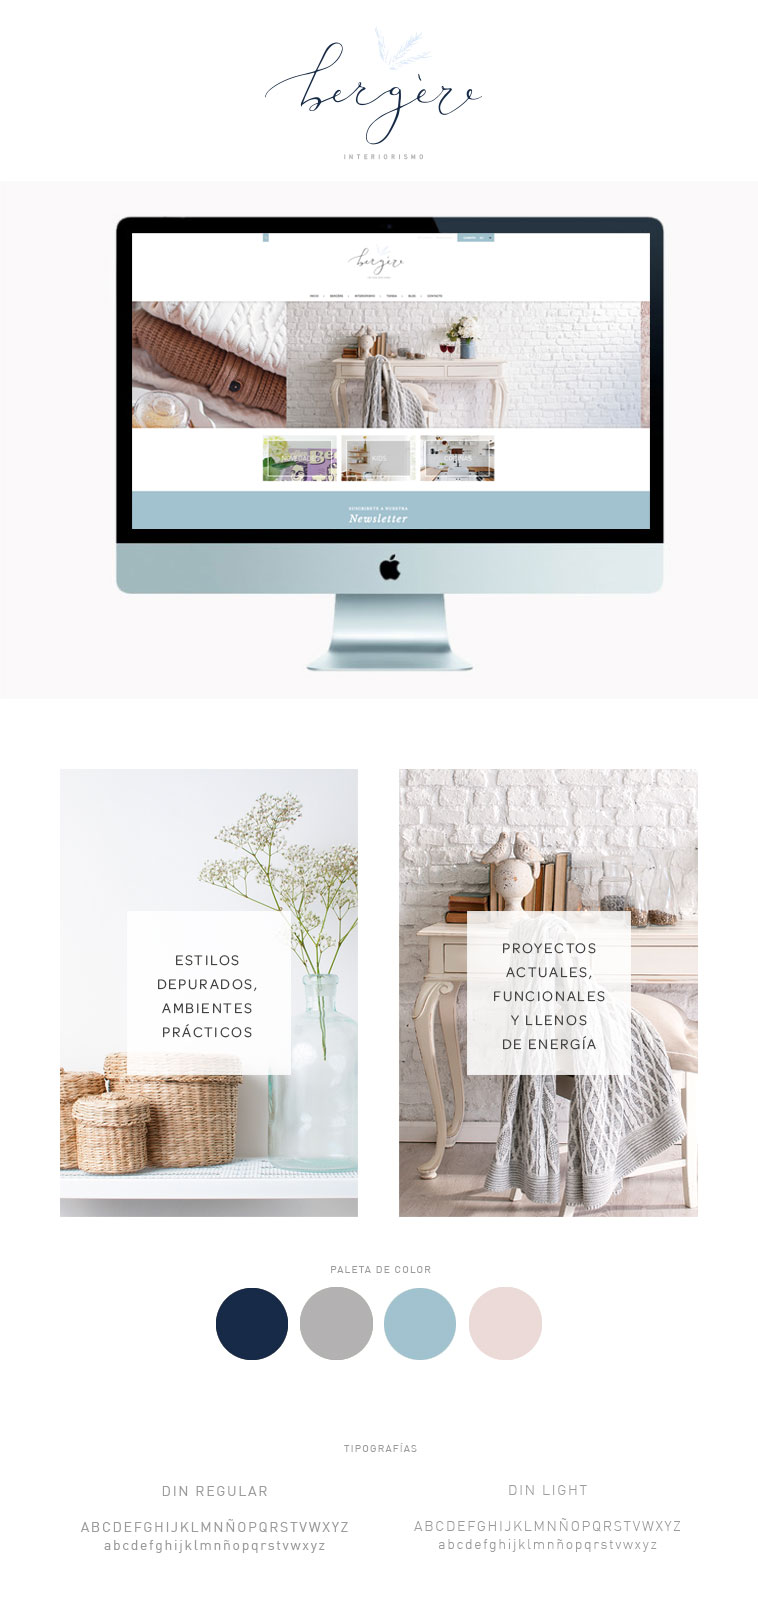 Present-web-Bergere-Interiorismo